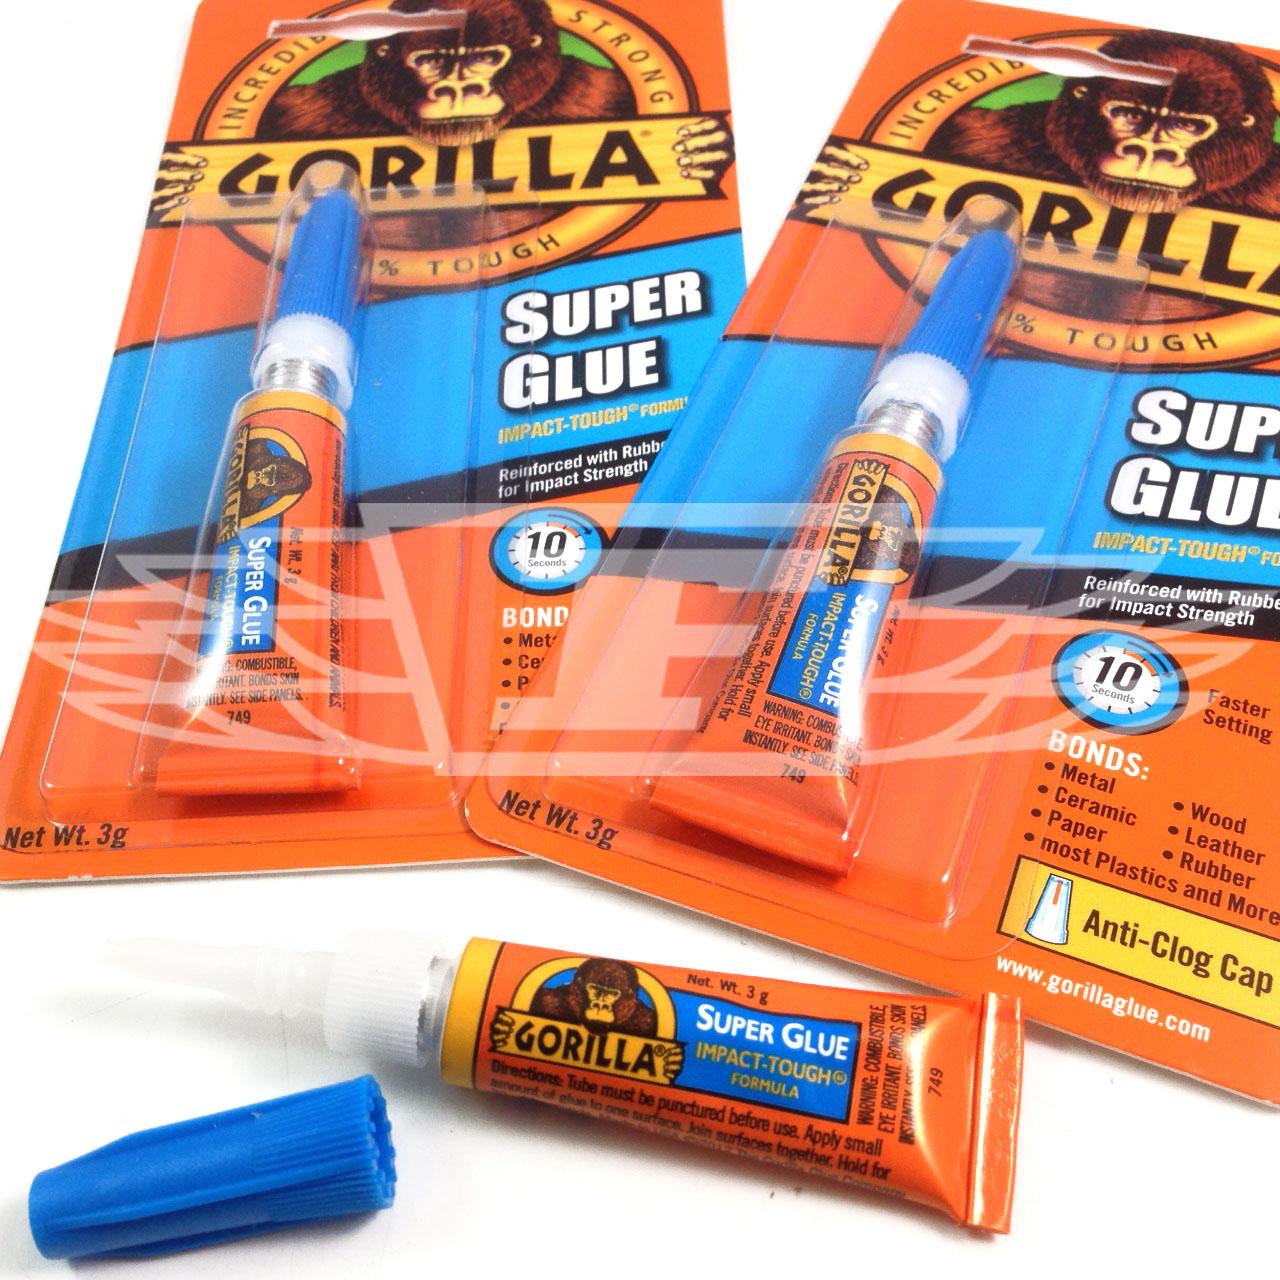 gorilla super glue 3g anti clog high strength new reinforced rubber strength ebay. Black Bedroom Furniture Sets. Home Design Ideas